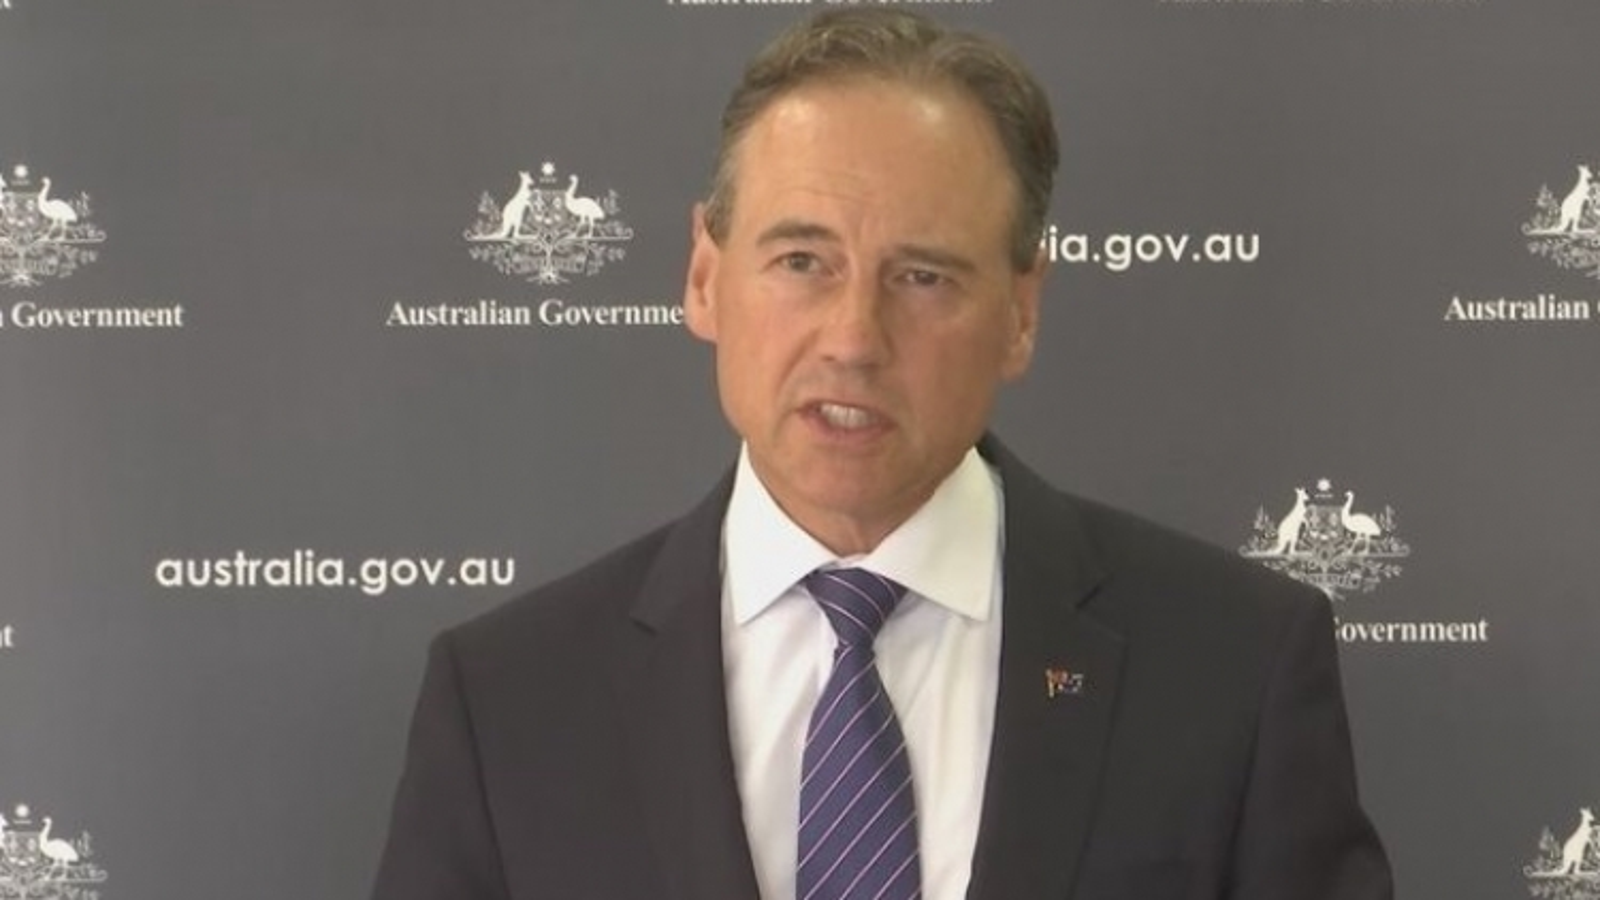 Australia chuẩn bị thử nghiệm khẩn cấp 2 loại vaccine Covid-19 nội địa mới